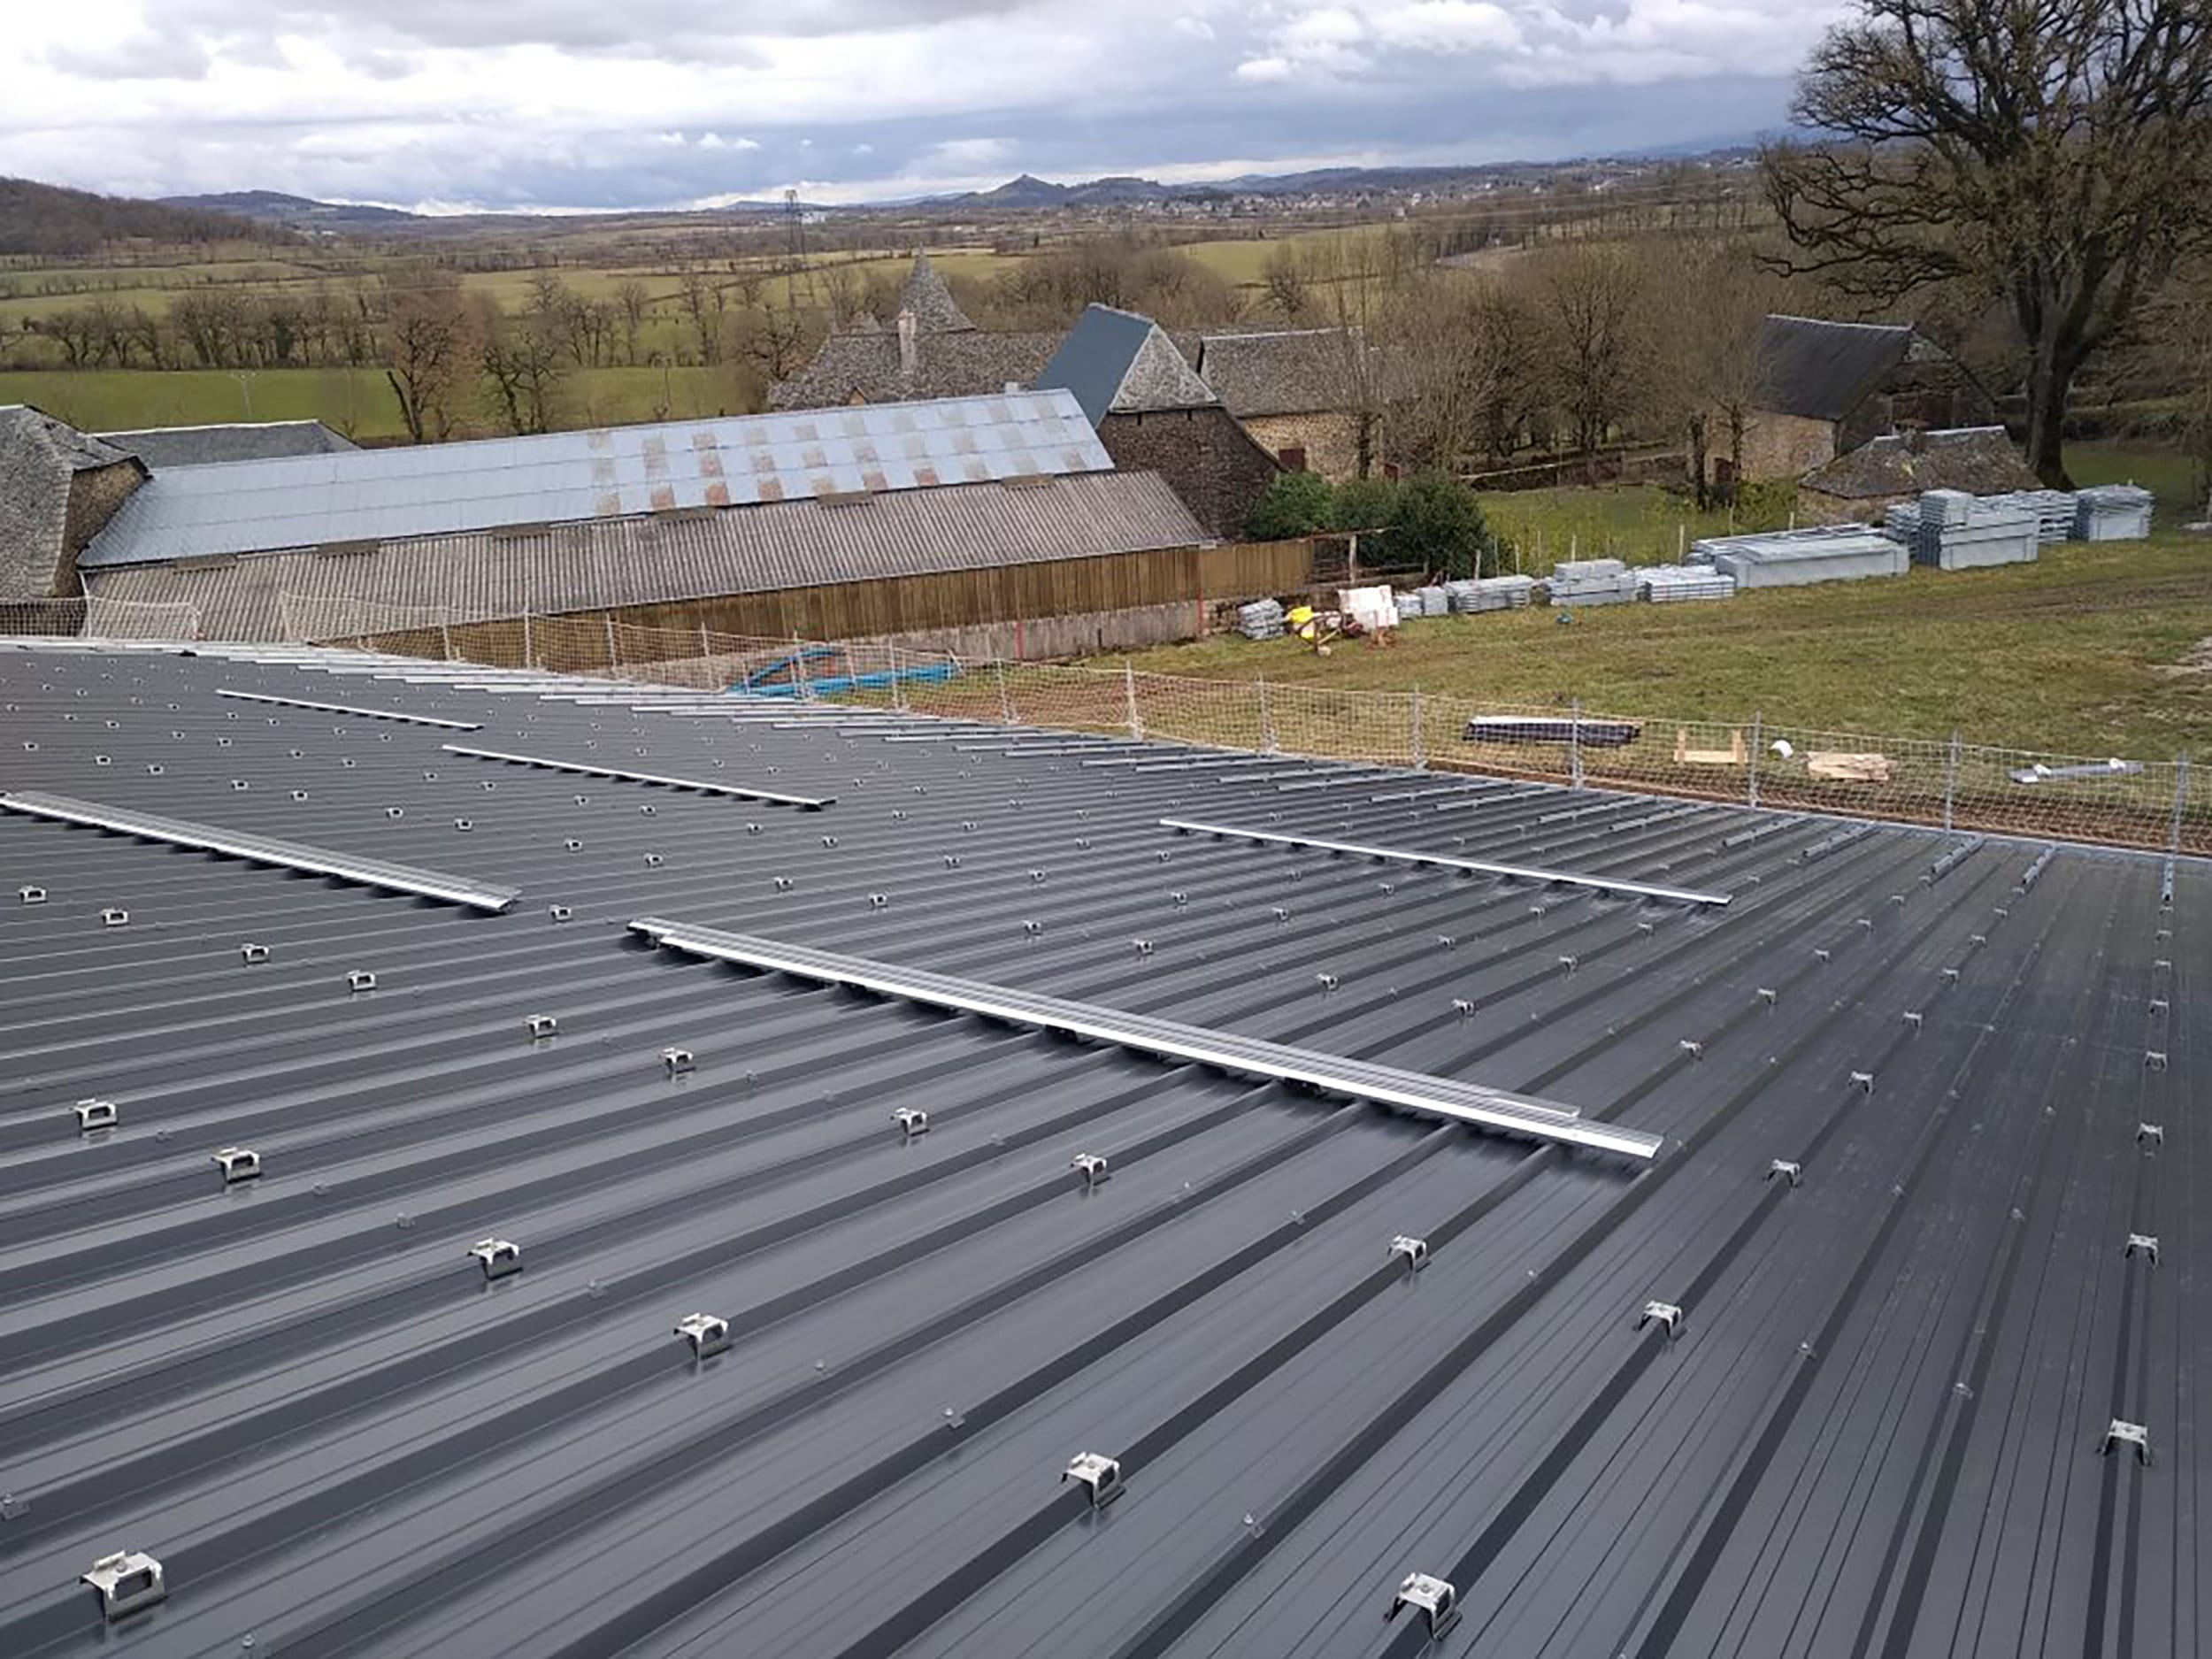 installation-toiture-photovoltaique-dun-batiment-agricole-laveyron